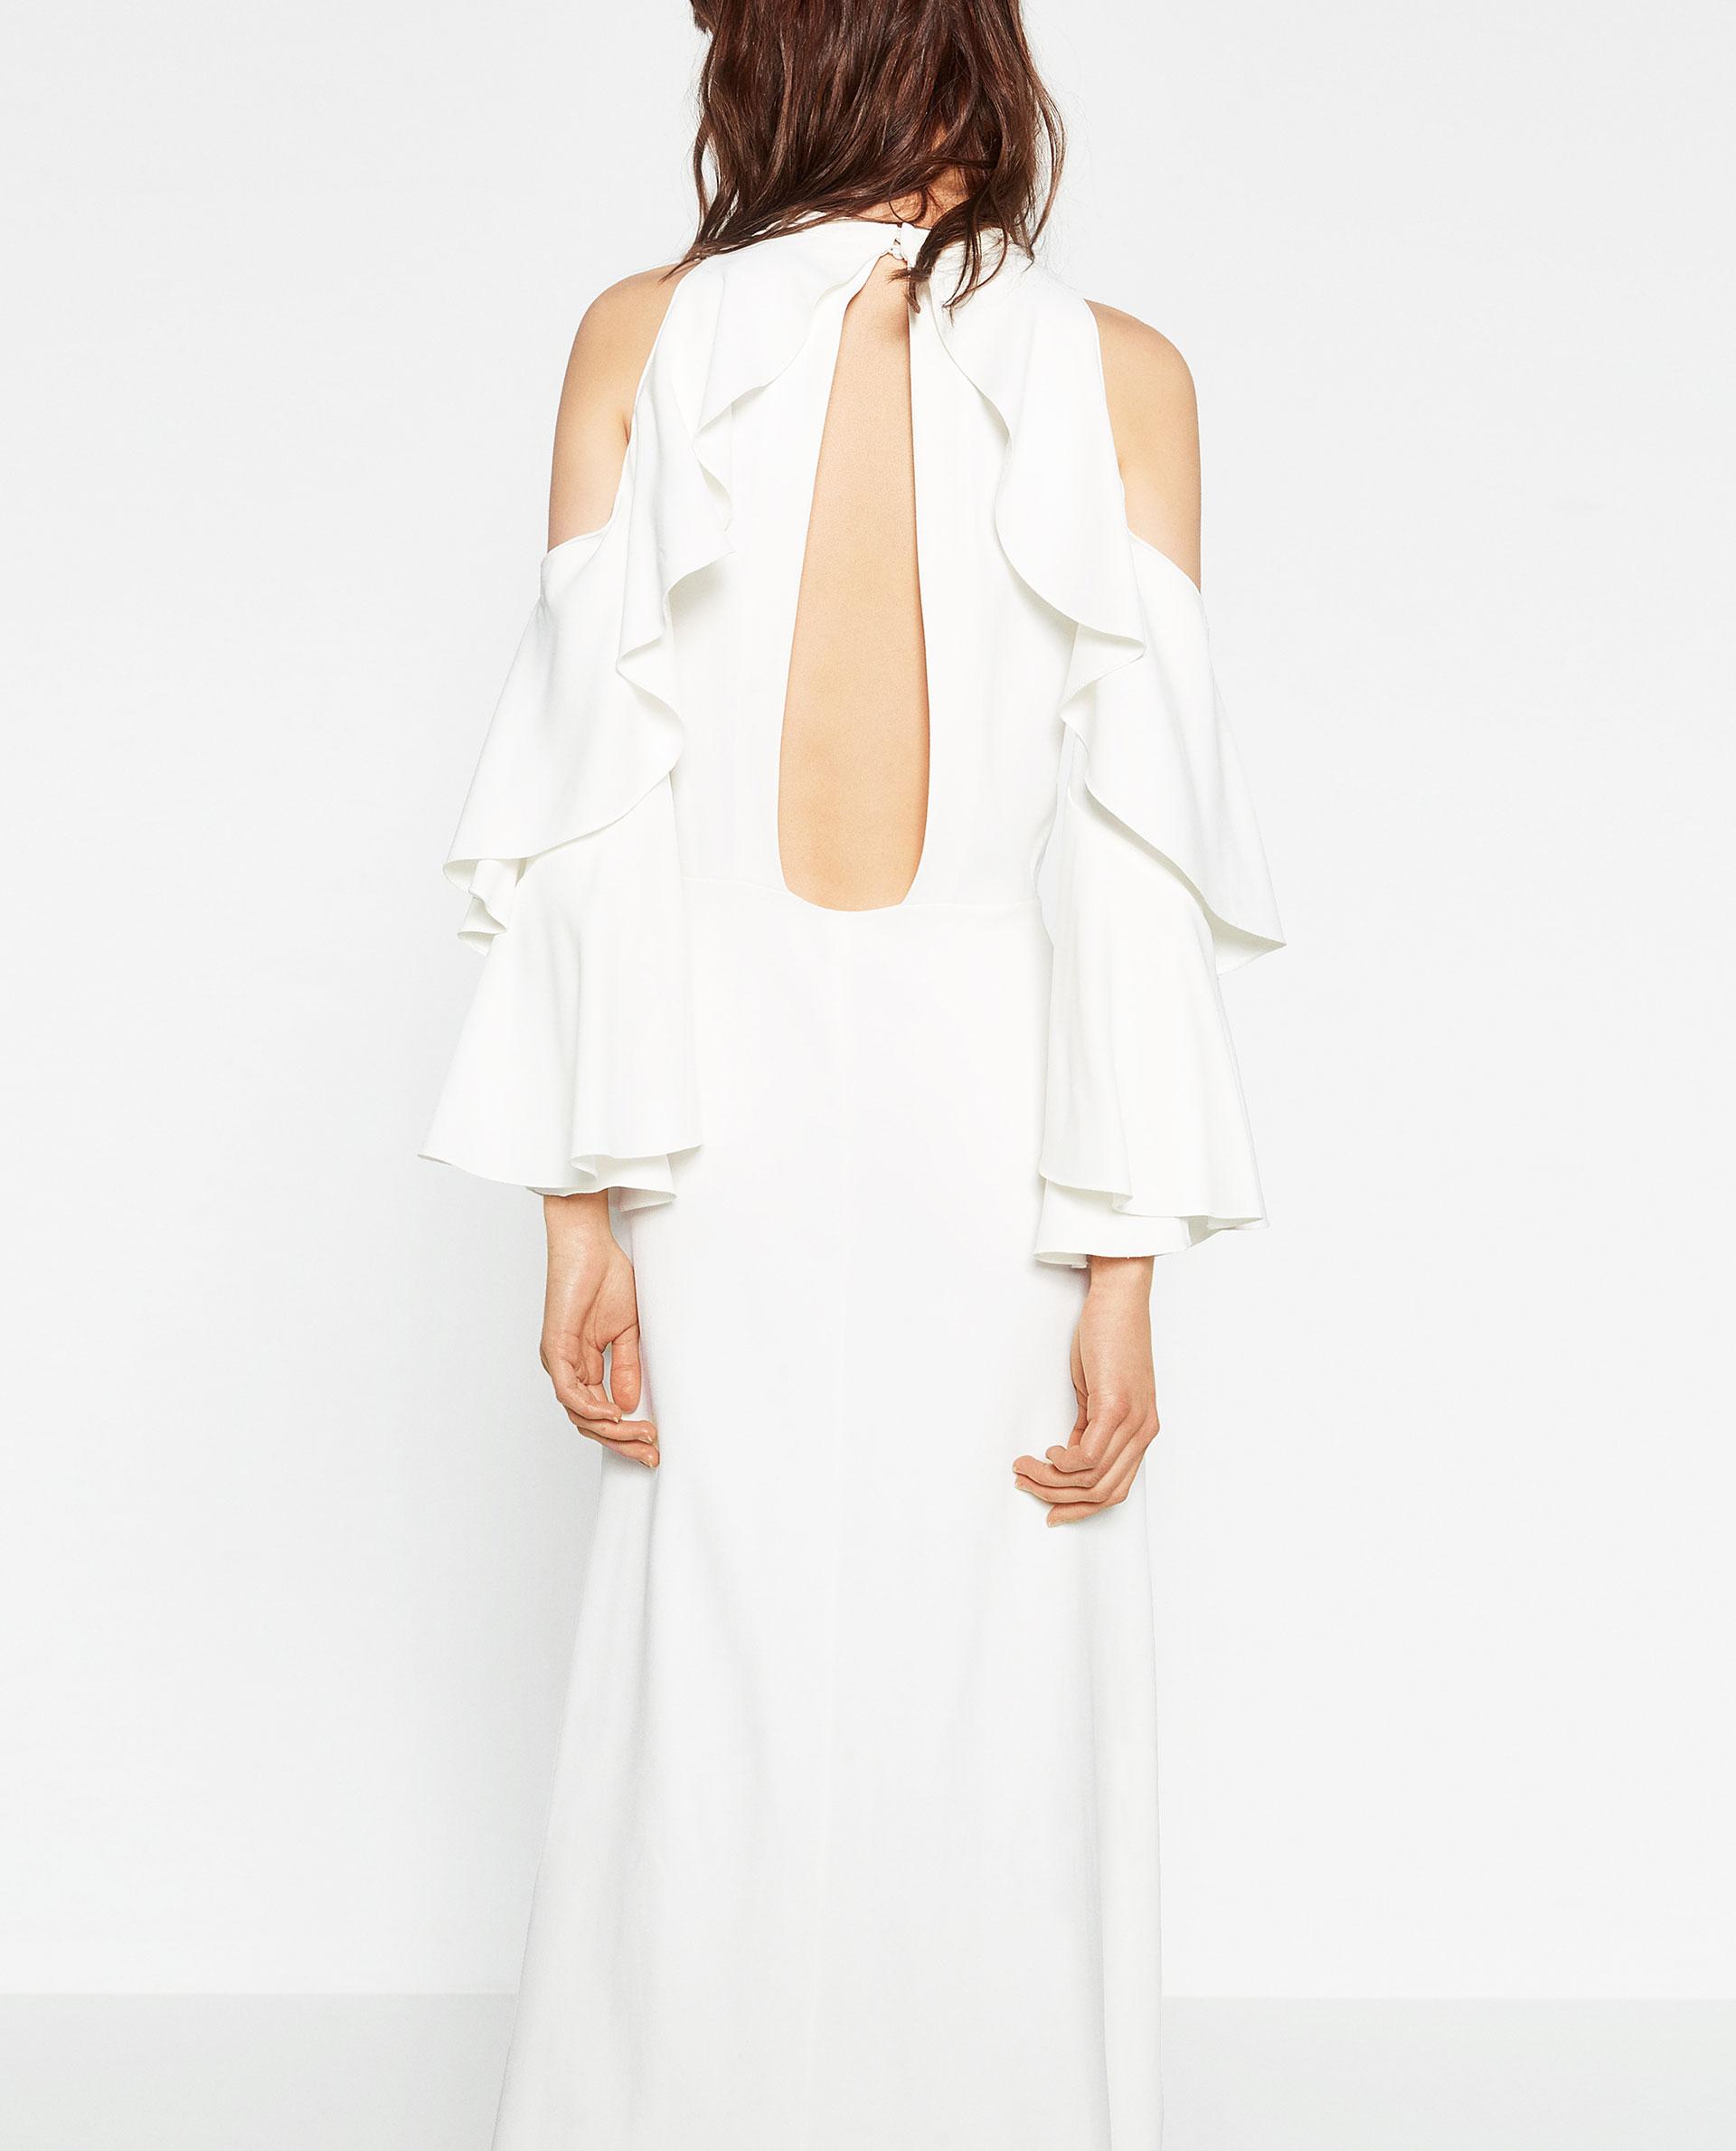 hombros-al-aire-moda-verano